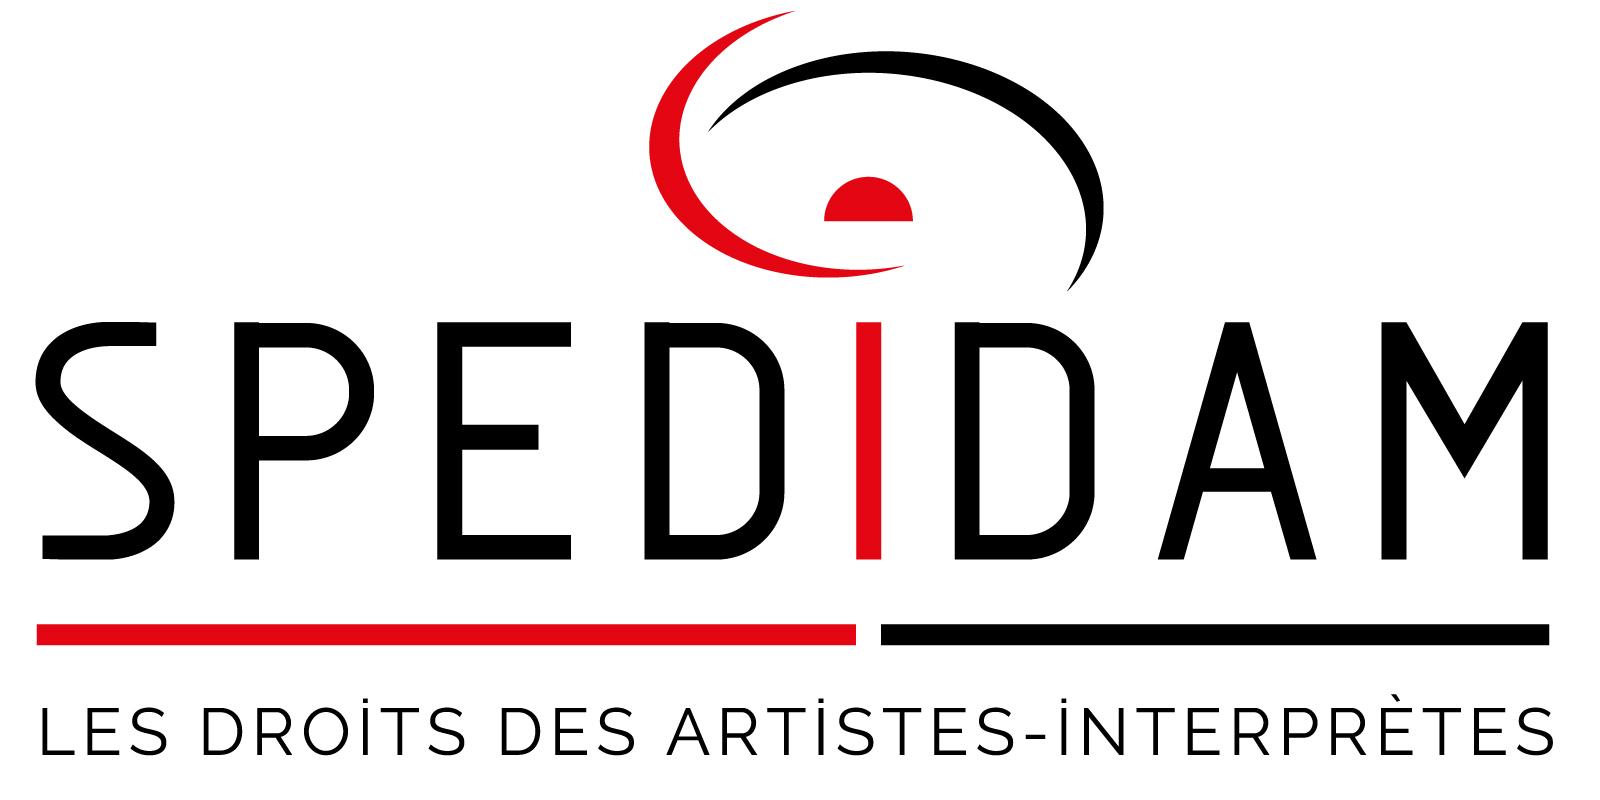 Spedidam - Les droits des artistes-interprètes